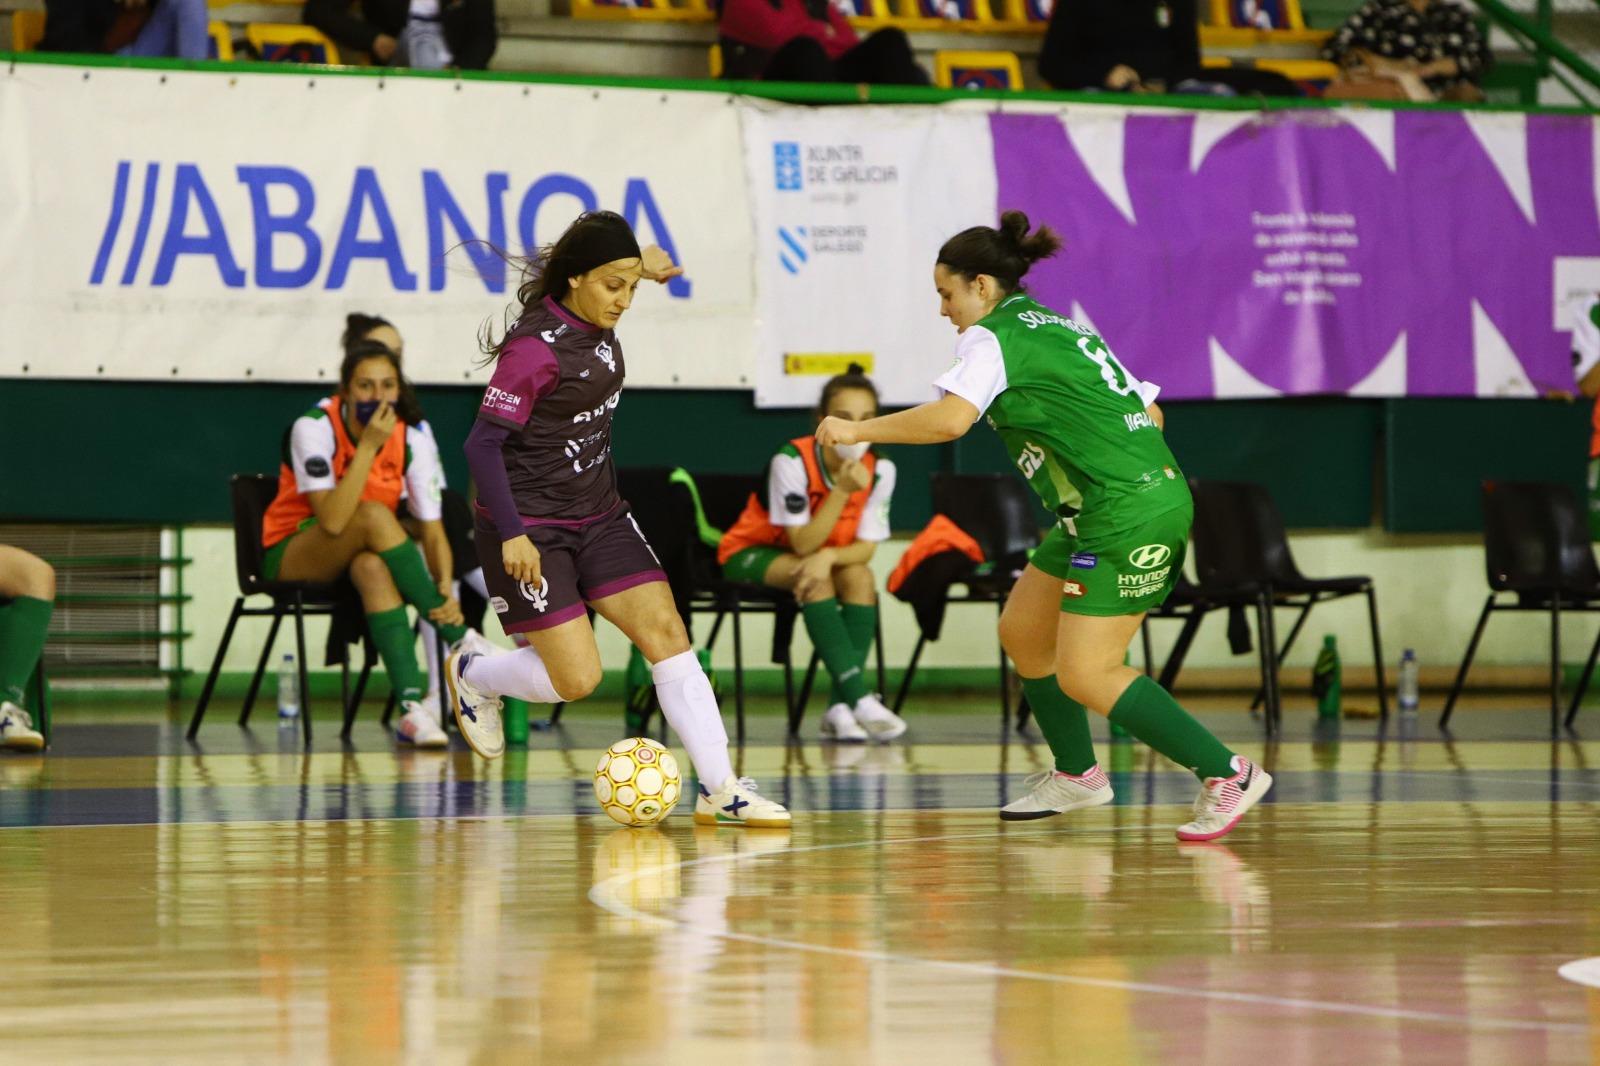 Derbi ourensán - Ourense Envialia vs Cidade de As Burgas / ENVIALIA TW